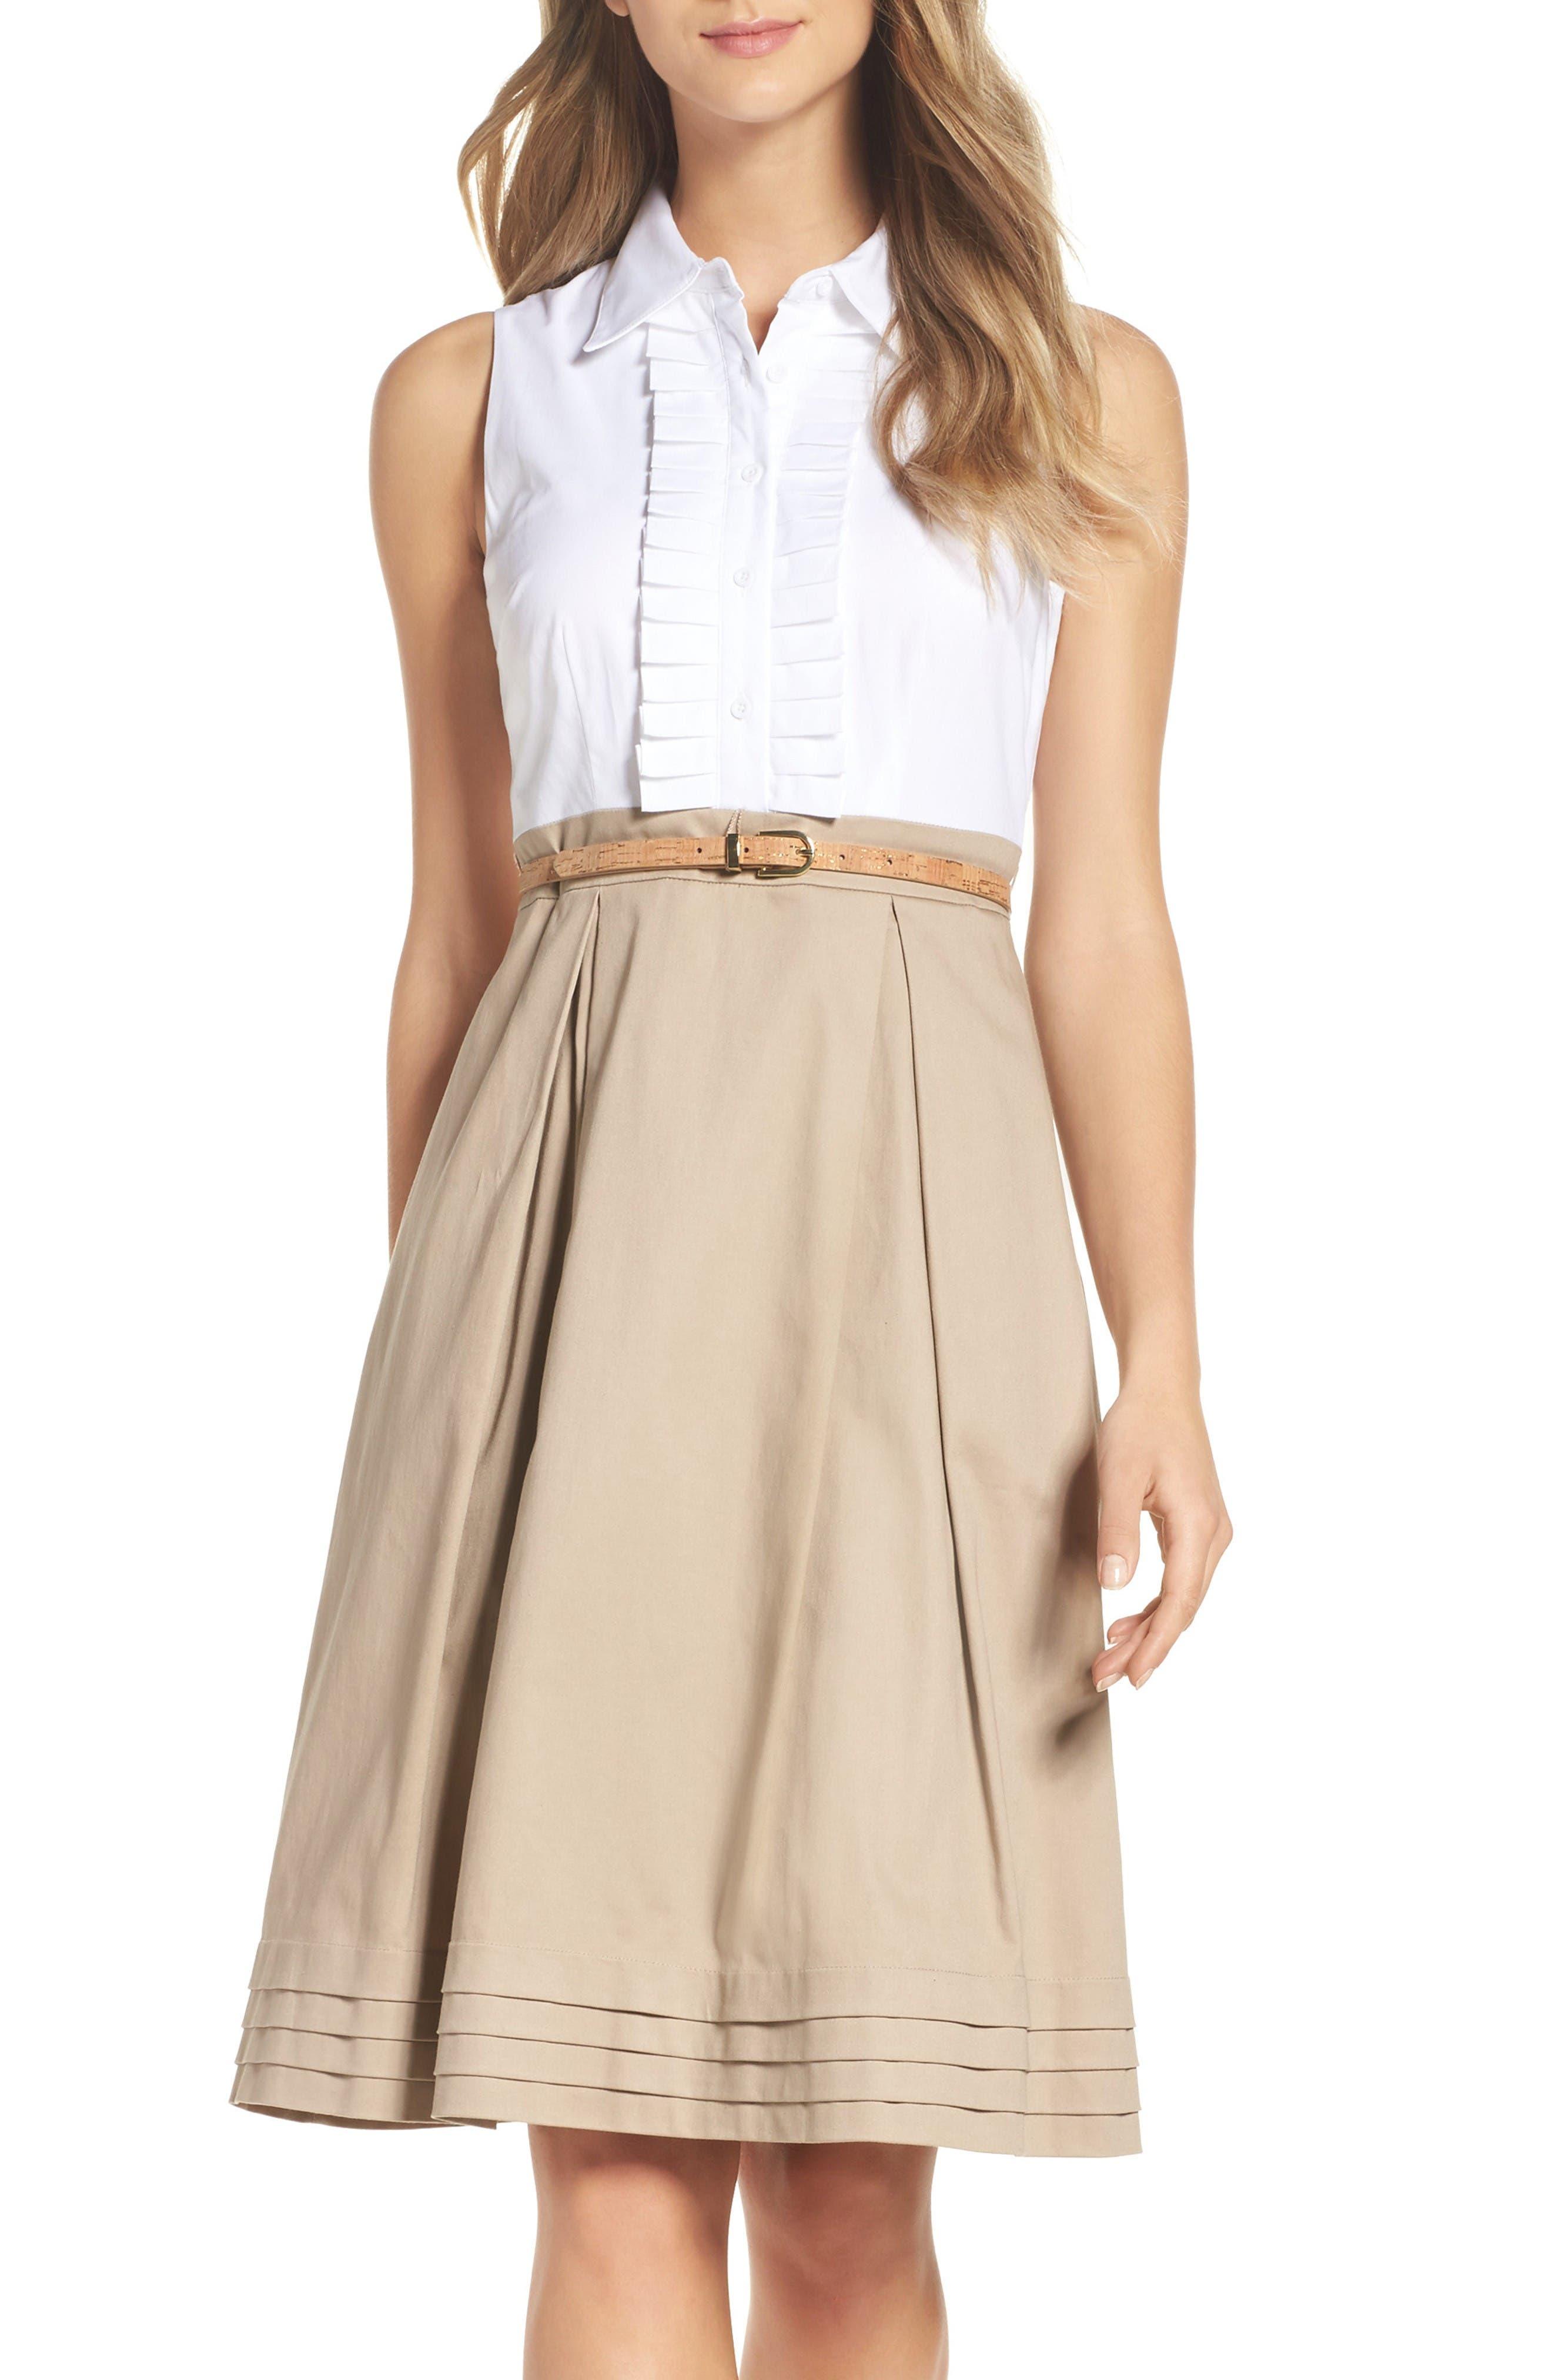 Alternate Image 1 Selected - Eliza J Ruffle Shirtdress (Regular & Petite)